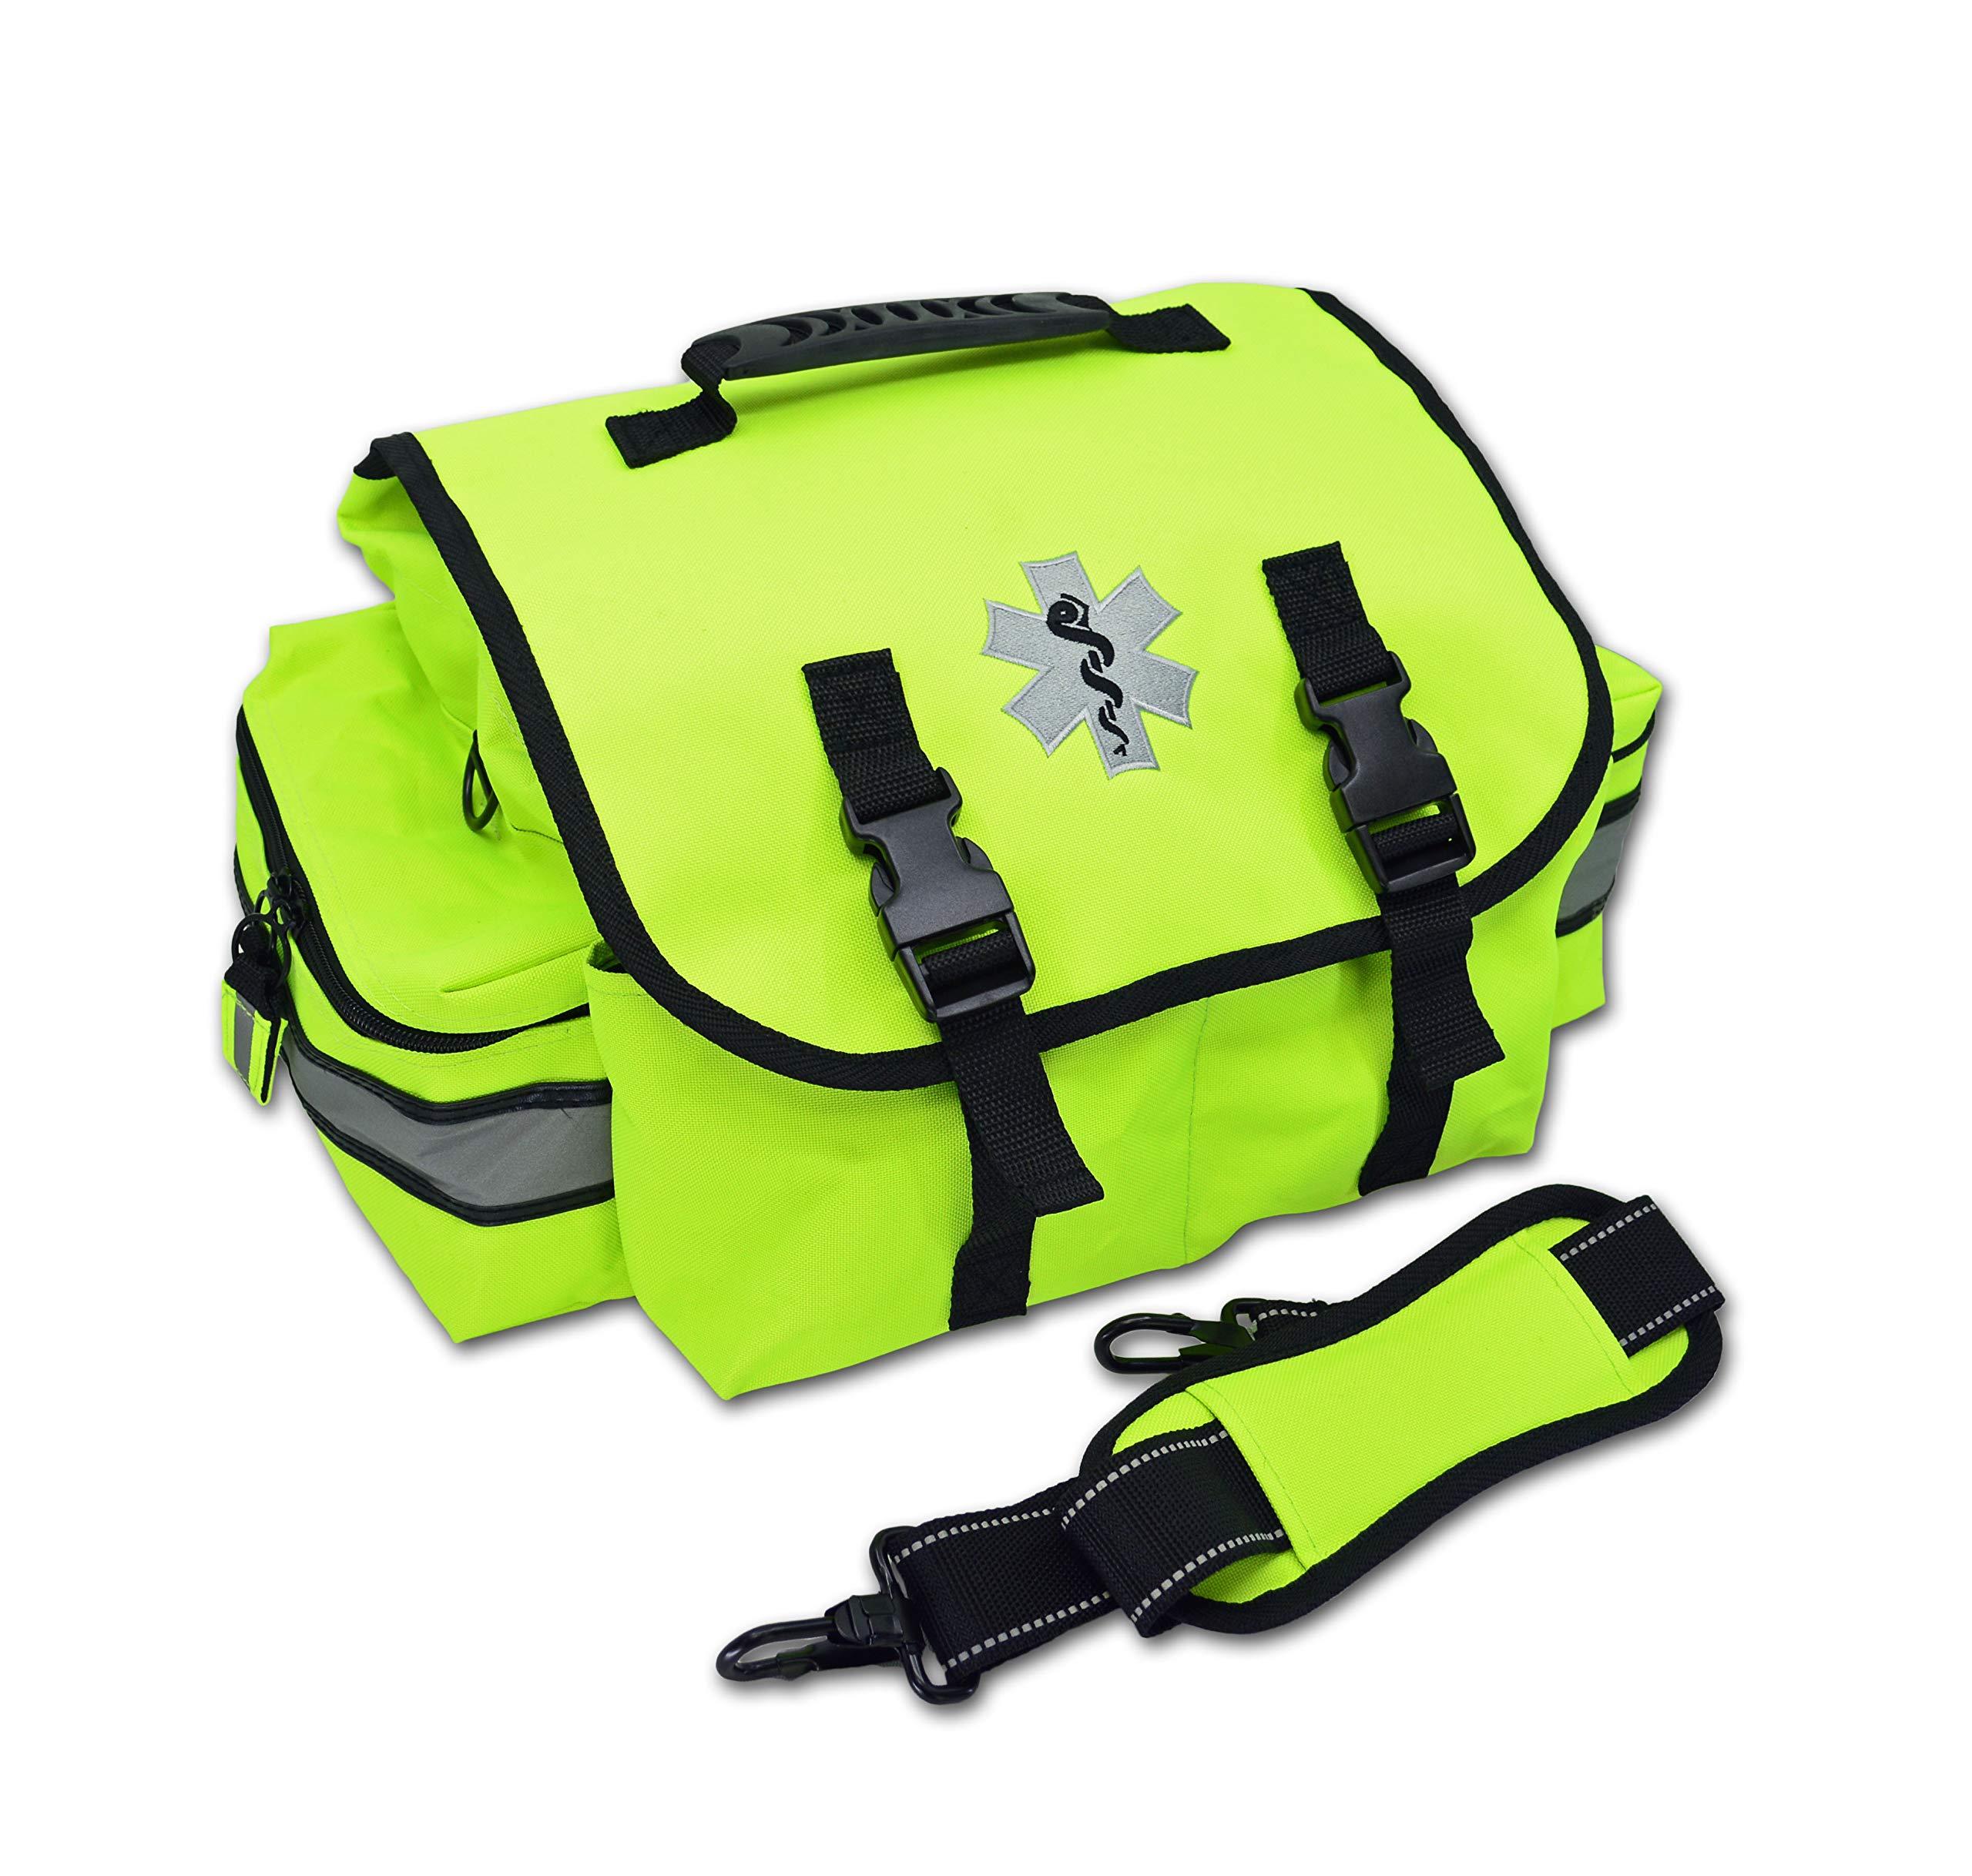 Lightning X Small EMT Medic First Responder Trauma EMS Jump Bag w/Dividers (Fluorescent Yellow)